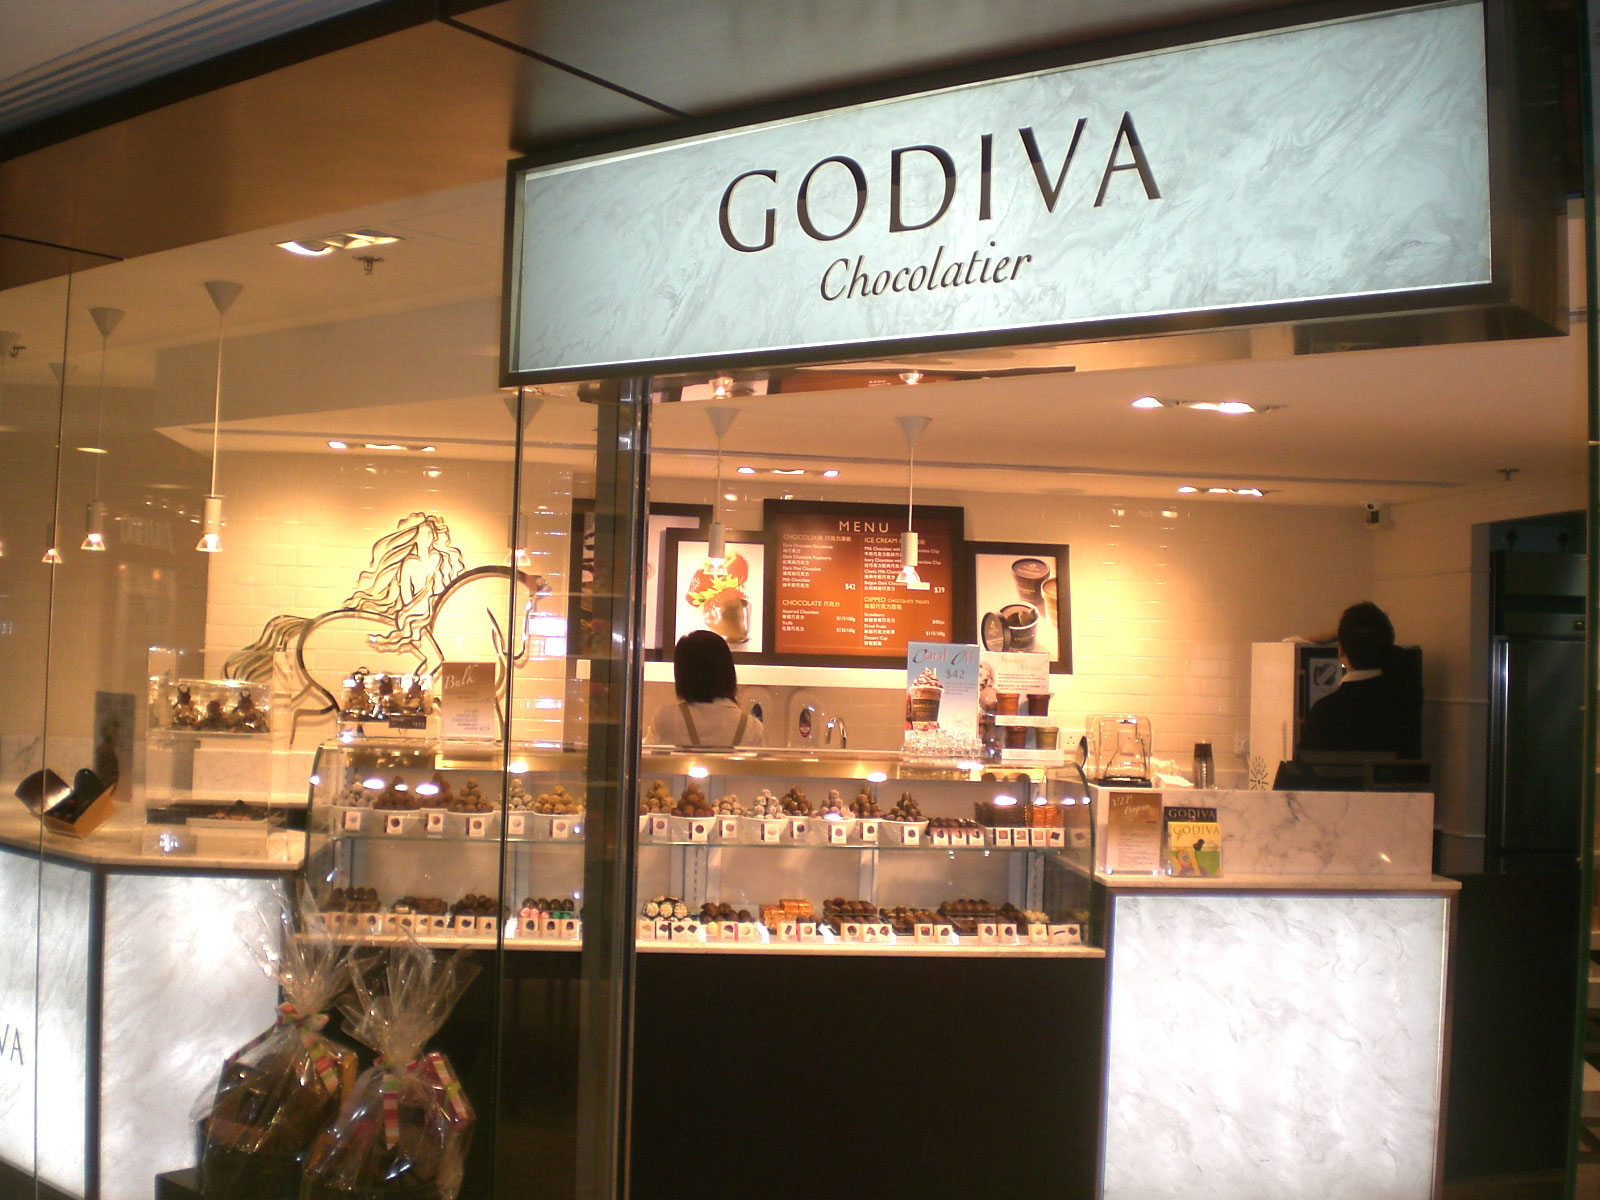 File:HK Kln Bay Telford Plaza GODIVA Chocolatier a.jpg - Wikimedia ...